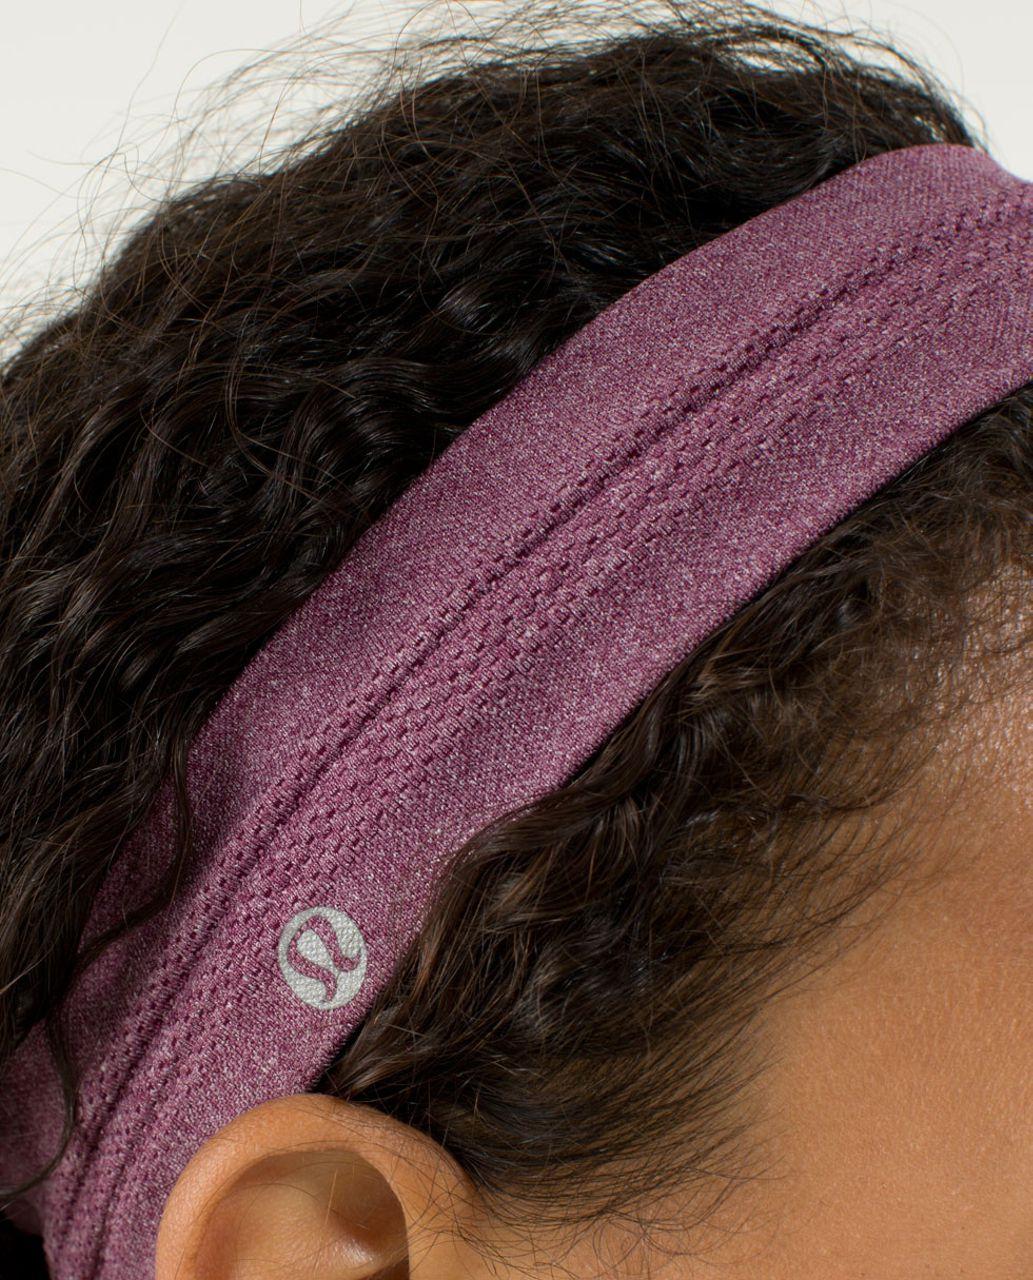 Lululemon Swiftly Headband - Heathered Plum